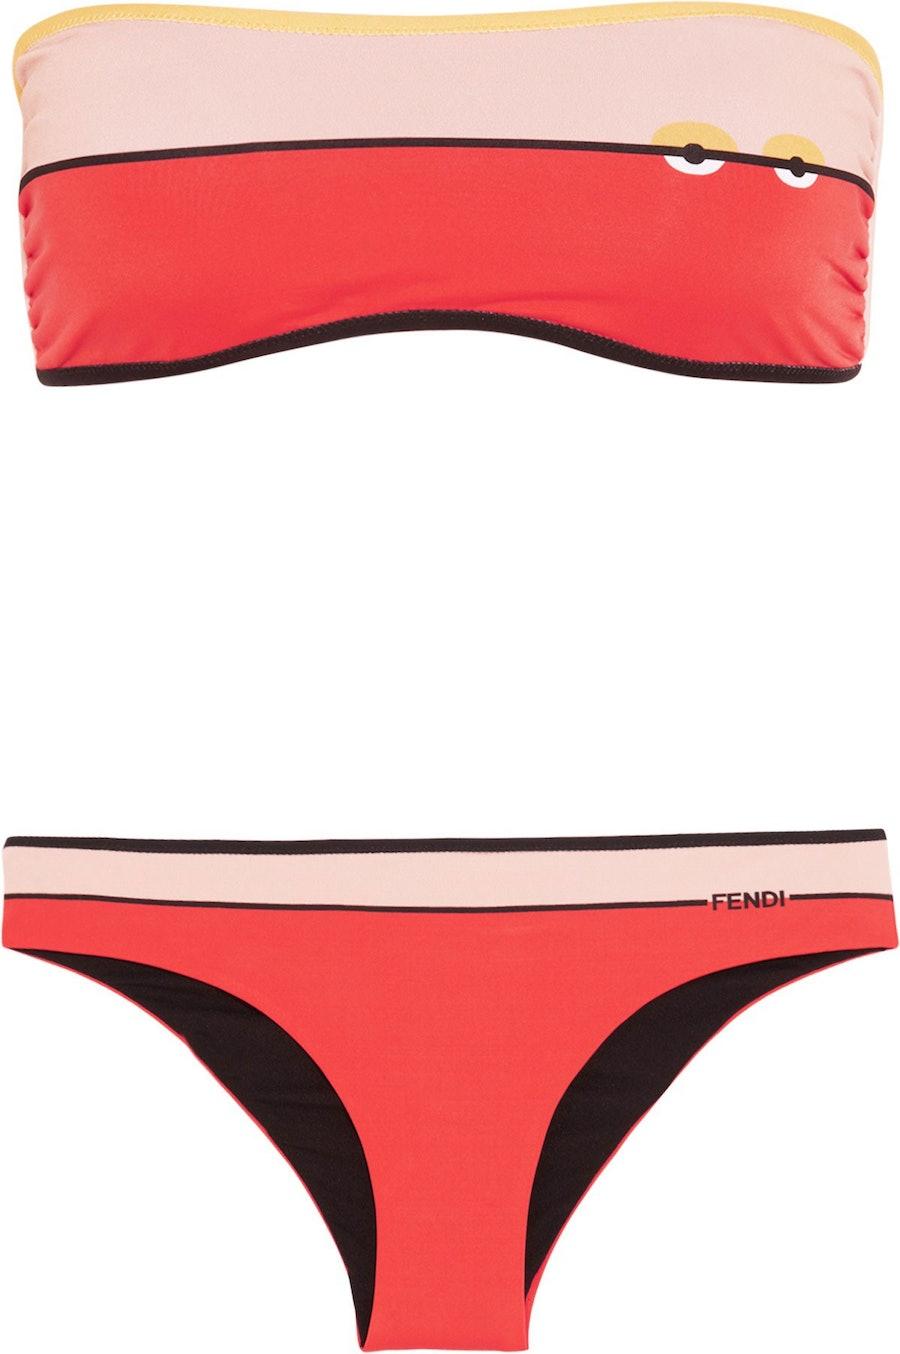 Fendi bikini, $330, [net-a-porter.com](http://www.net-a-porter.com).